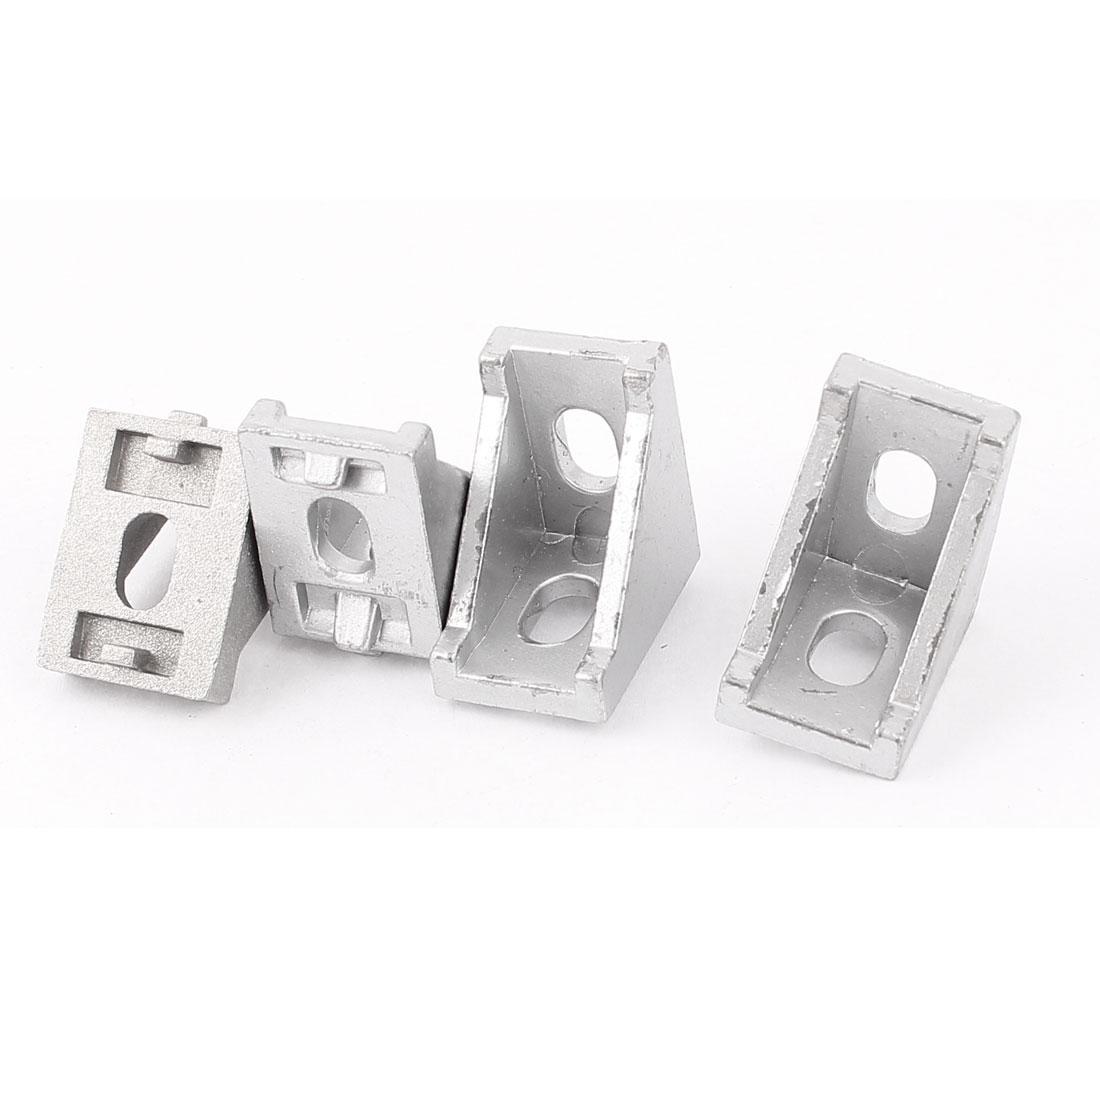 Silver Tone Aluminum Alloy 28x28x20mm Corner Brace Angle Bracket Support 4PCS